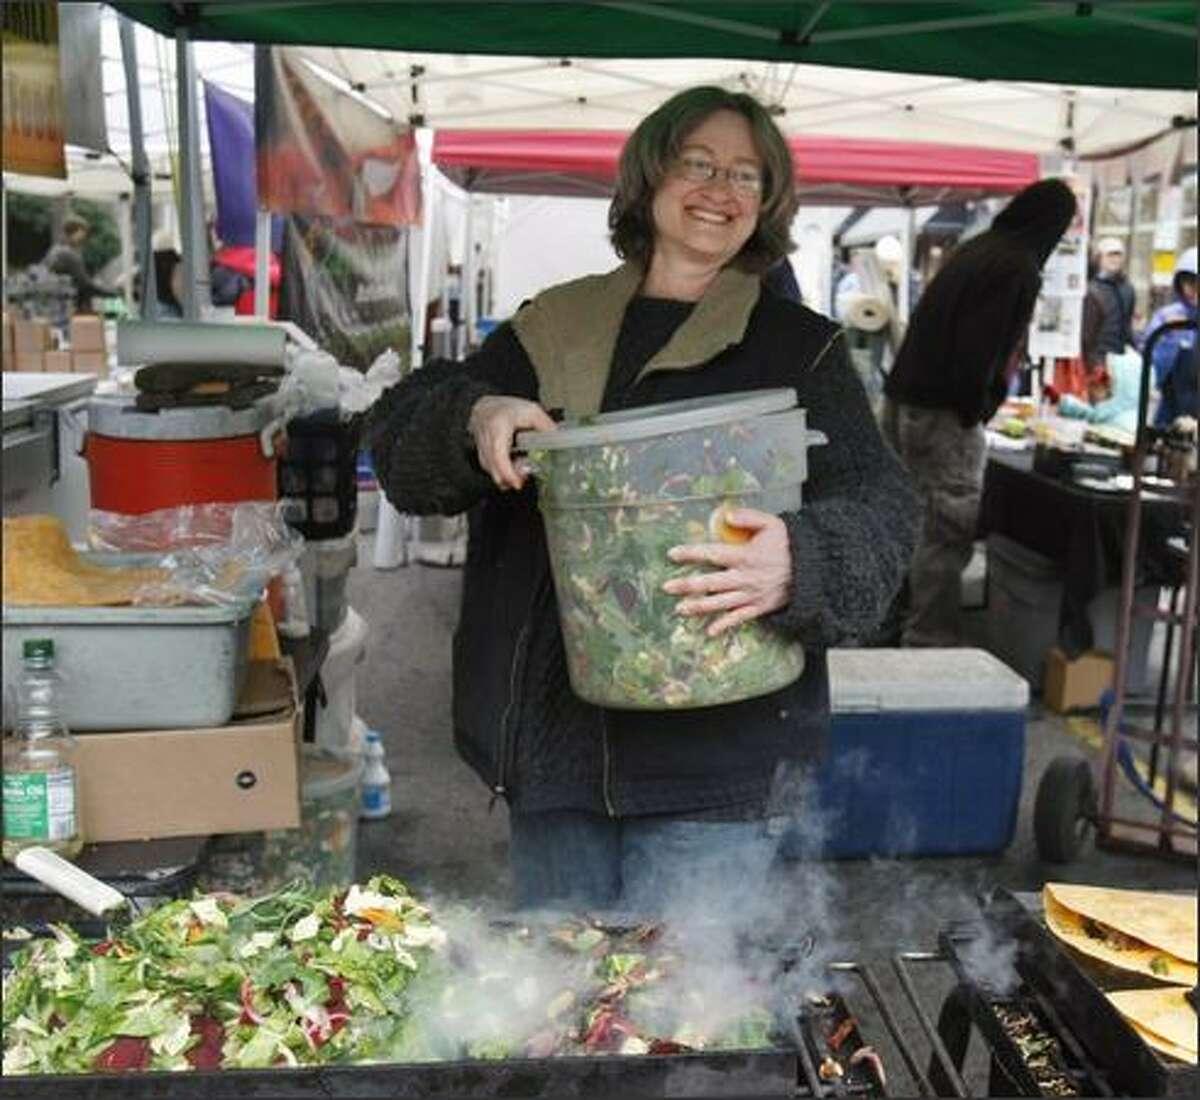 Devra Gartenstein, who makes a mean veggie quesadilla at the Ballard Farmers Market, wrote a new seasonal cookbook,